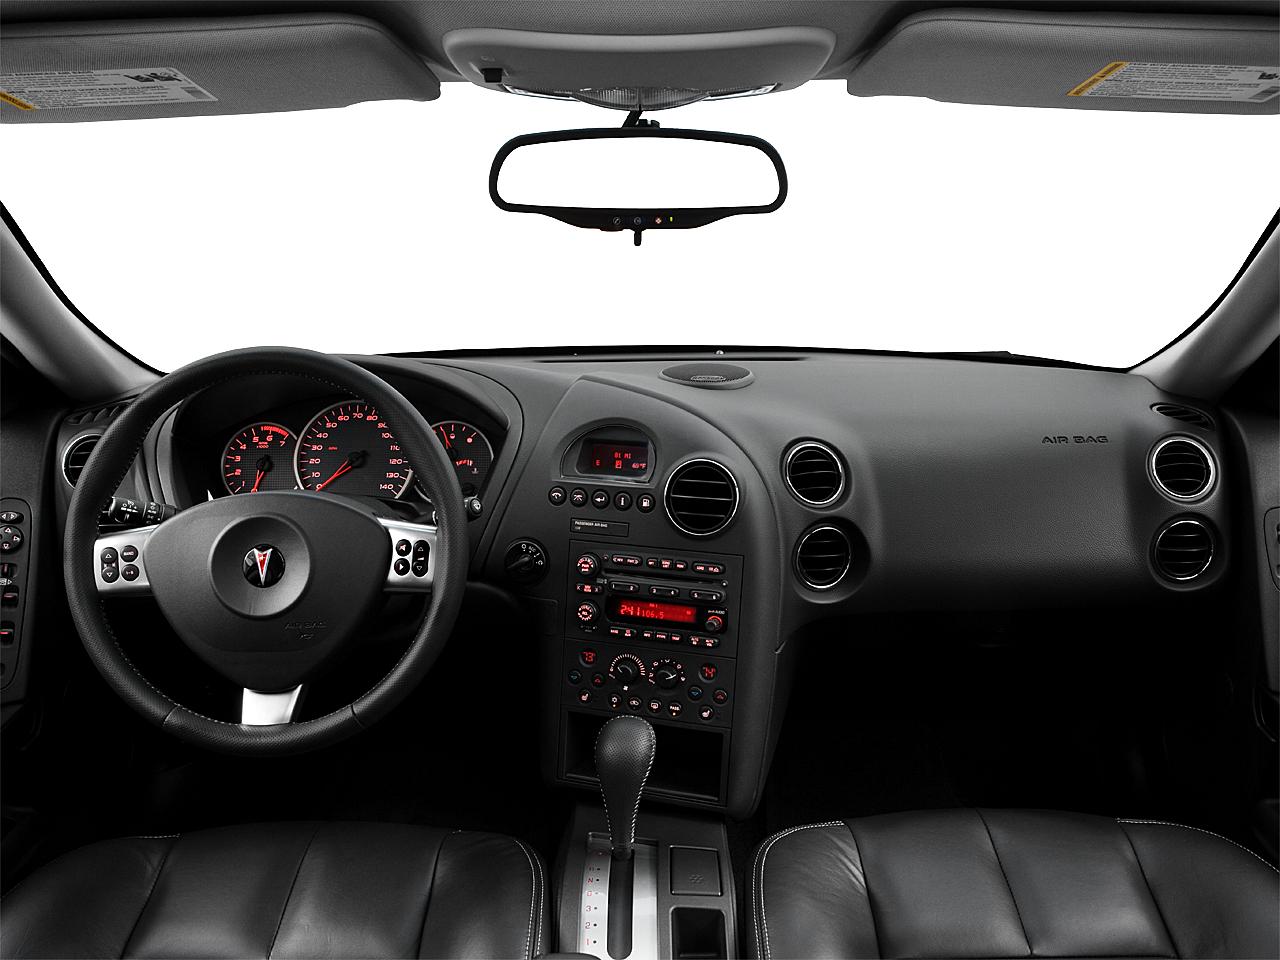 2007 pontiac grand prix gxp 4dr sedan research groovecar. Black Bedroom Furniture Sets. Home Design Ideas